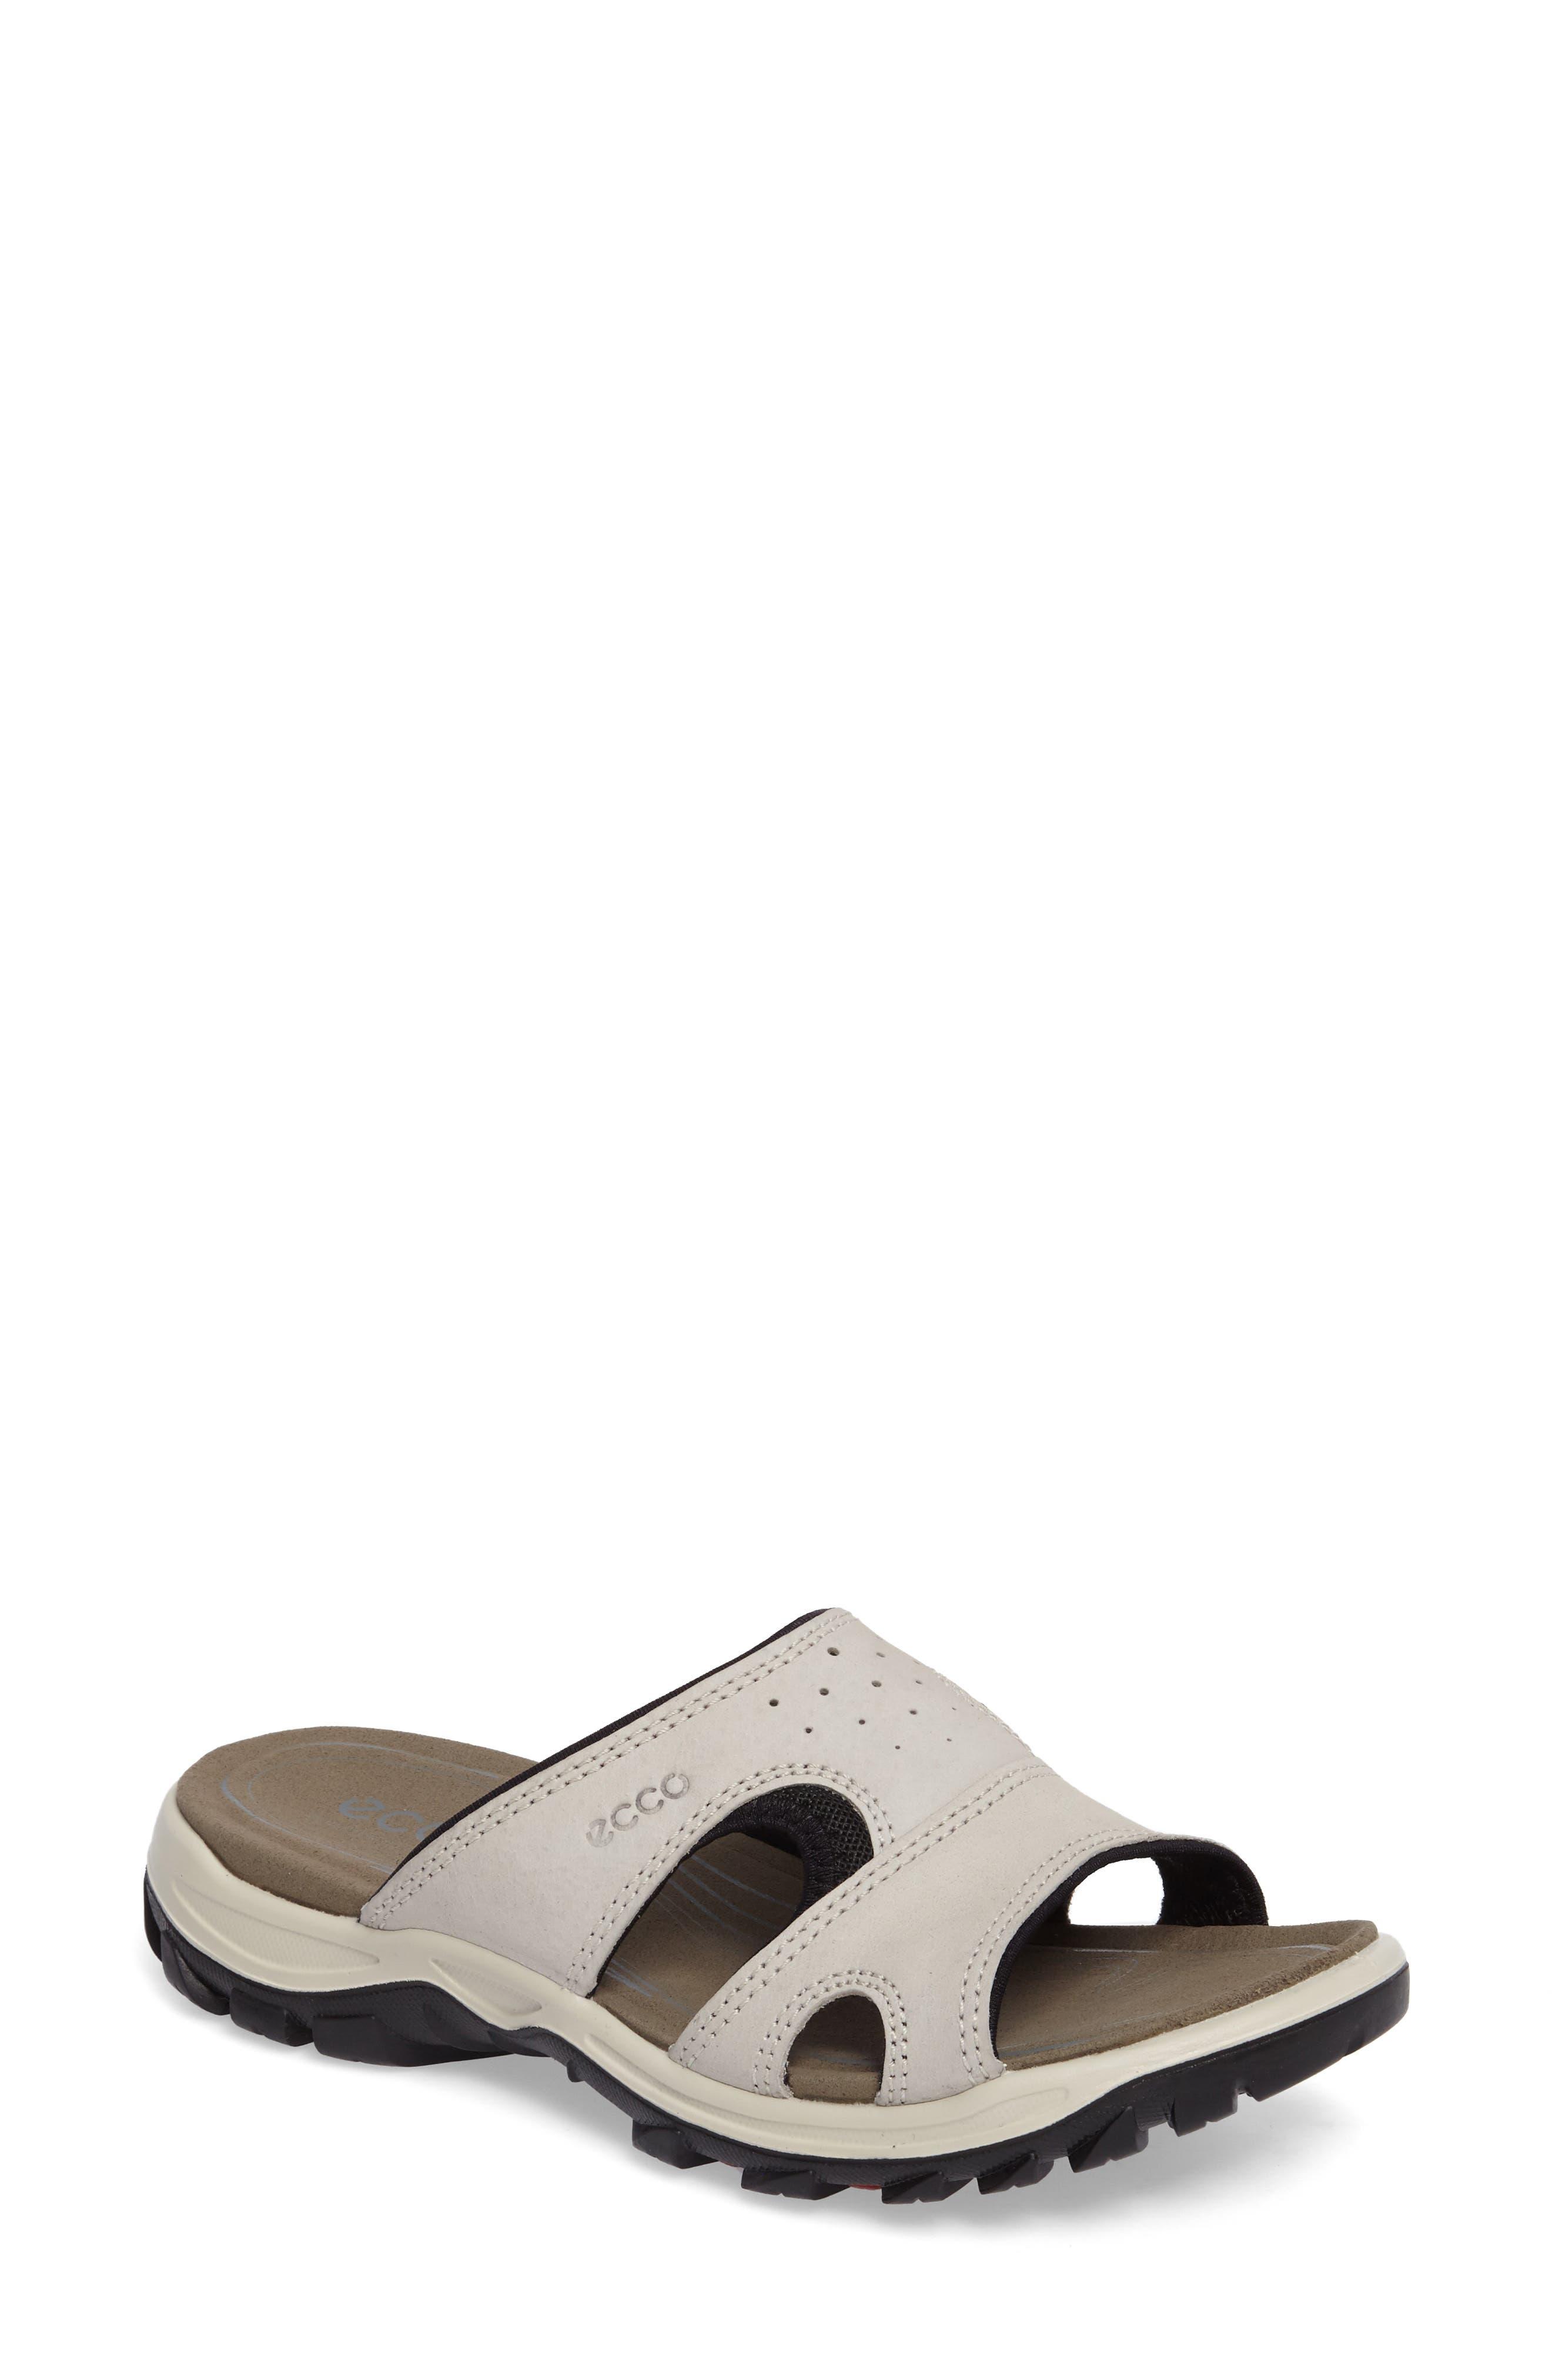 Main Image - ECCO Offroad Lite Slide Sandal (Women)